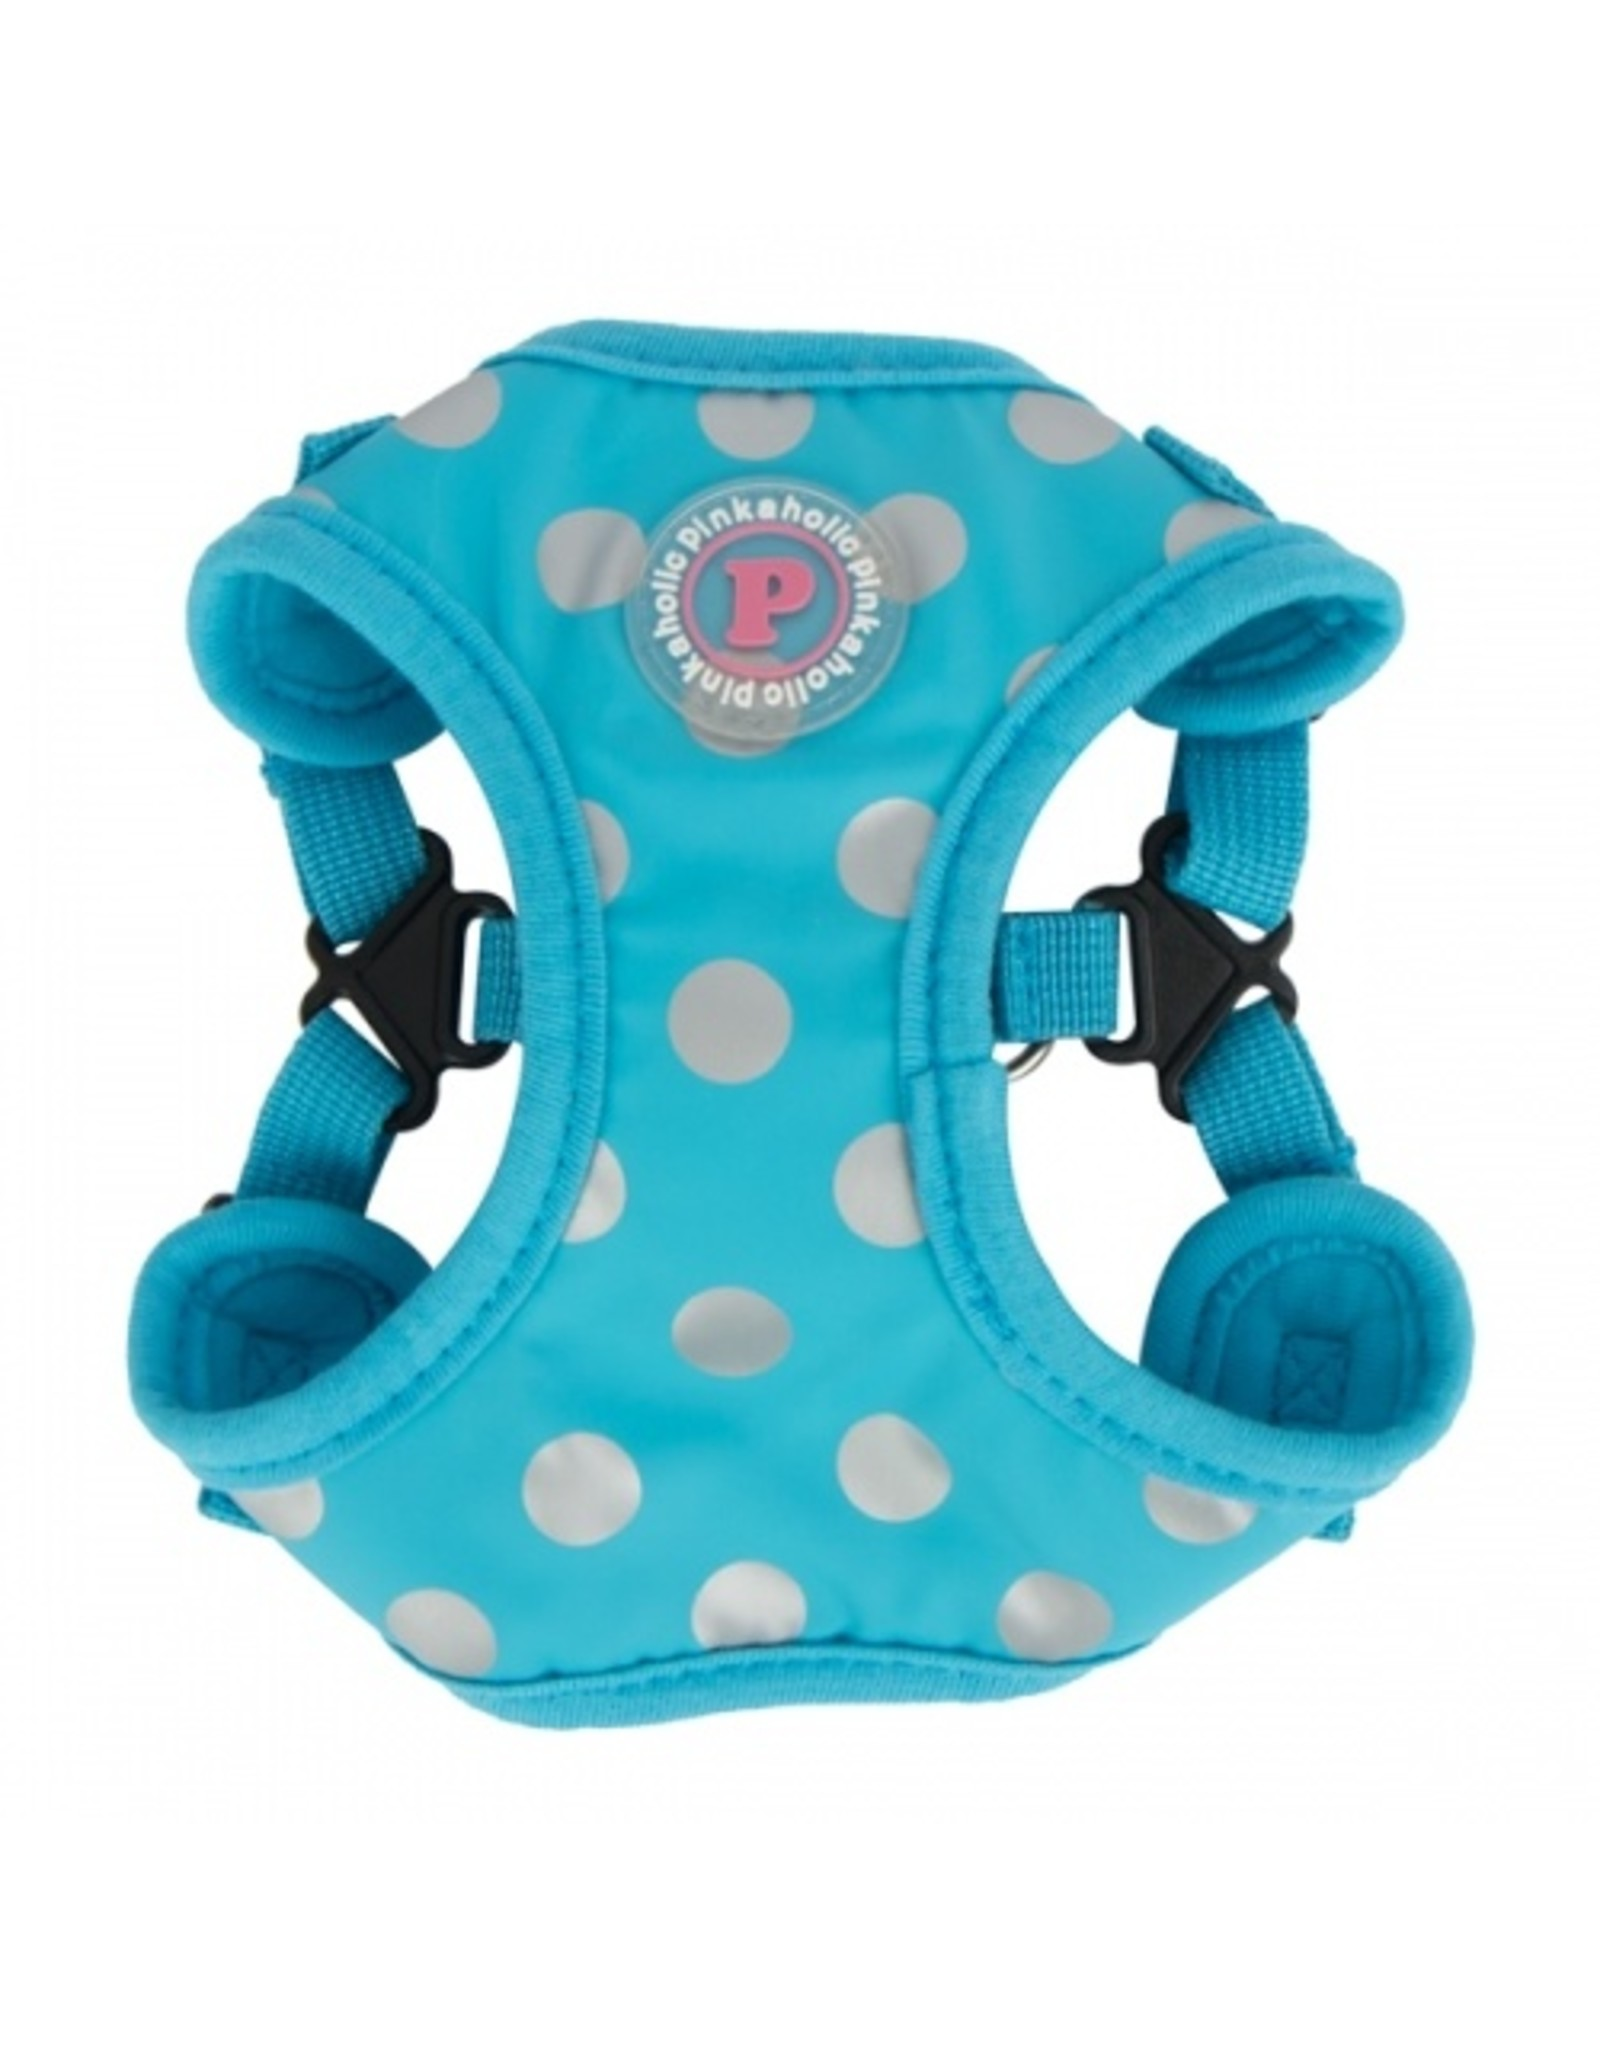 Pinkaholic Pinkaholic Chic Harness C Blue